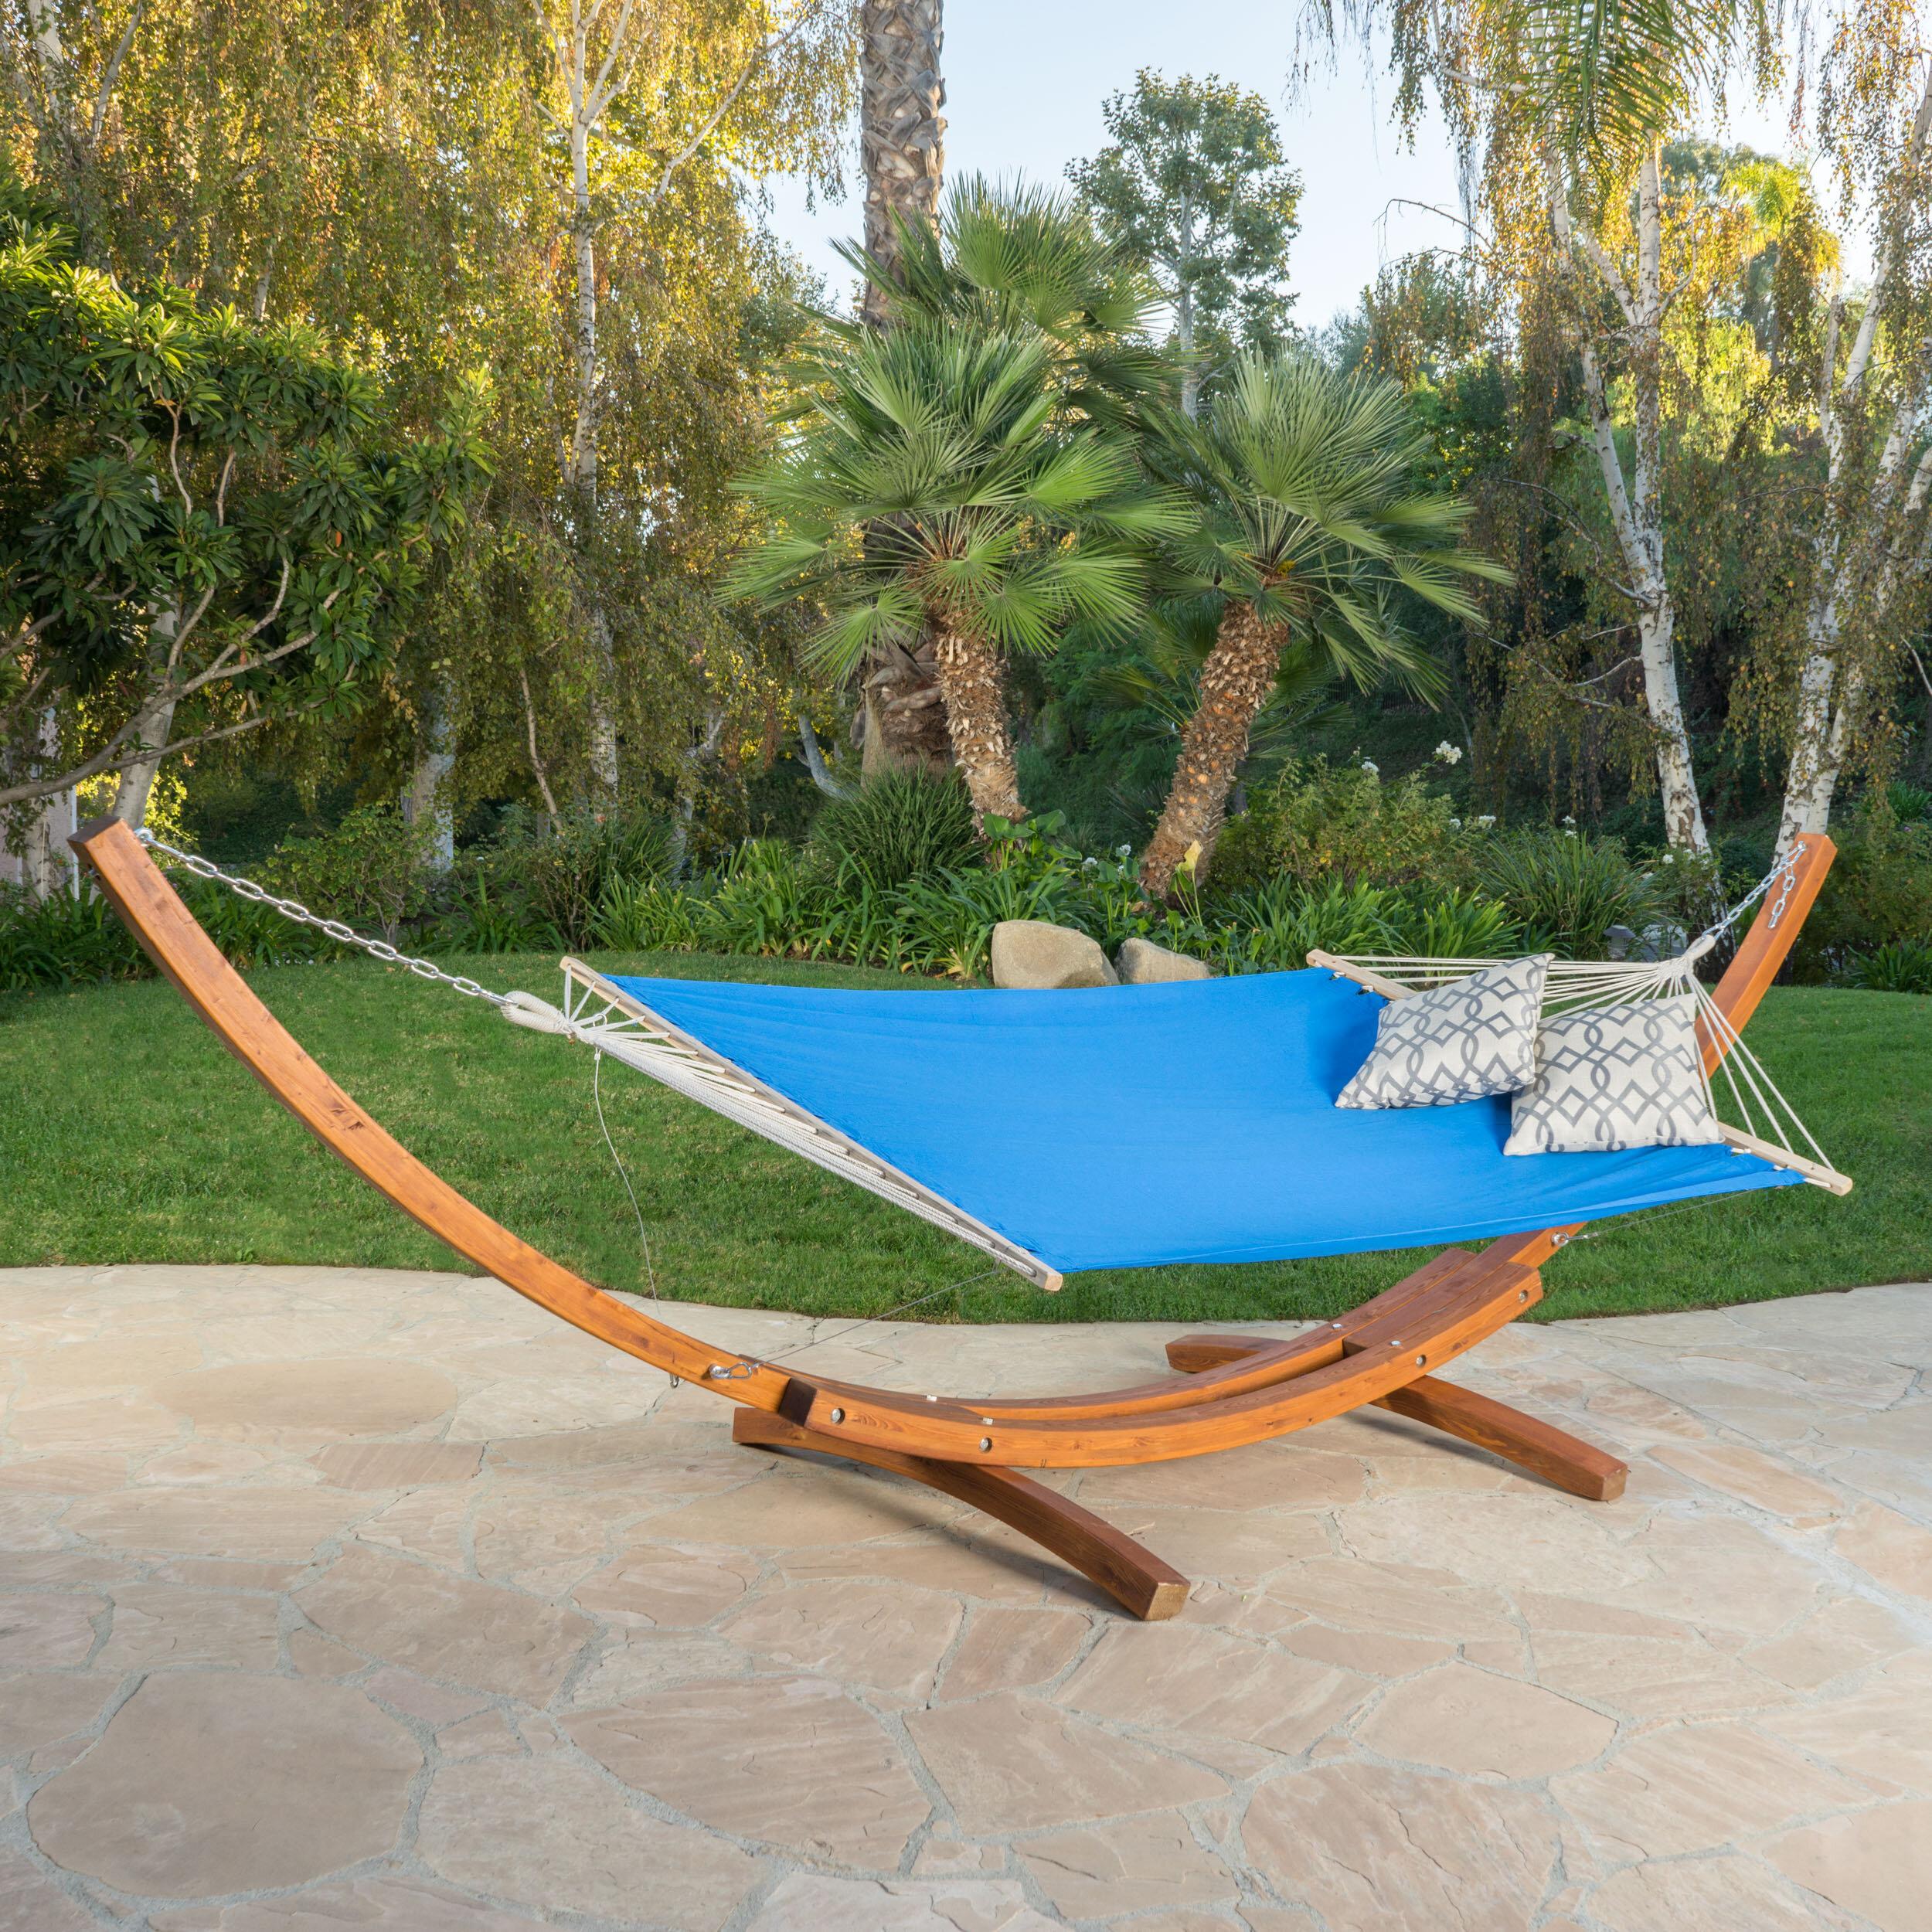 frame outdoor steel chair indoor stand stands hammock diy wood swing cheap wooden woodworking